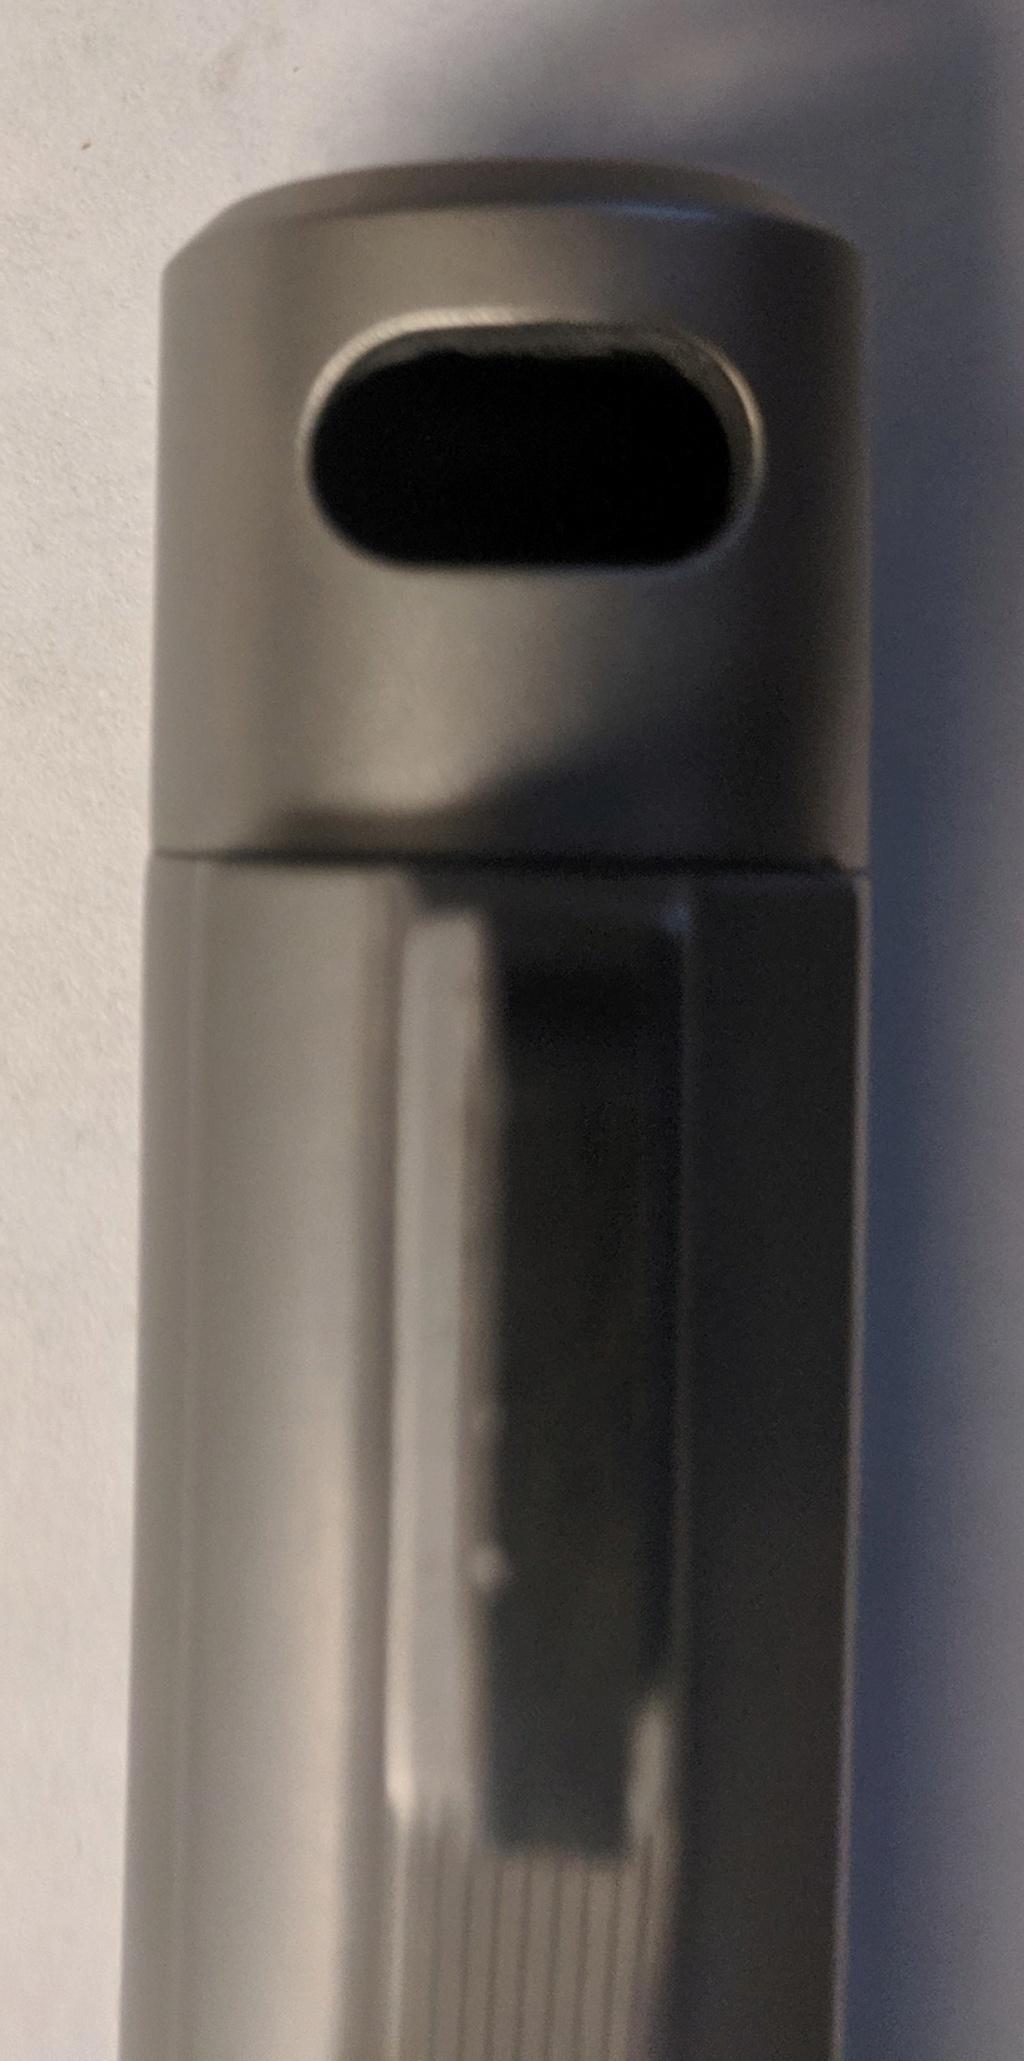 SOLD - S&W 929 9mm Revolver Img_2181